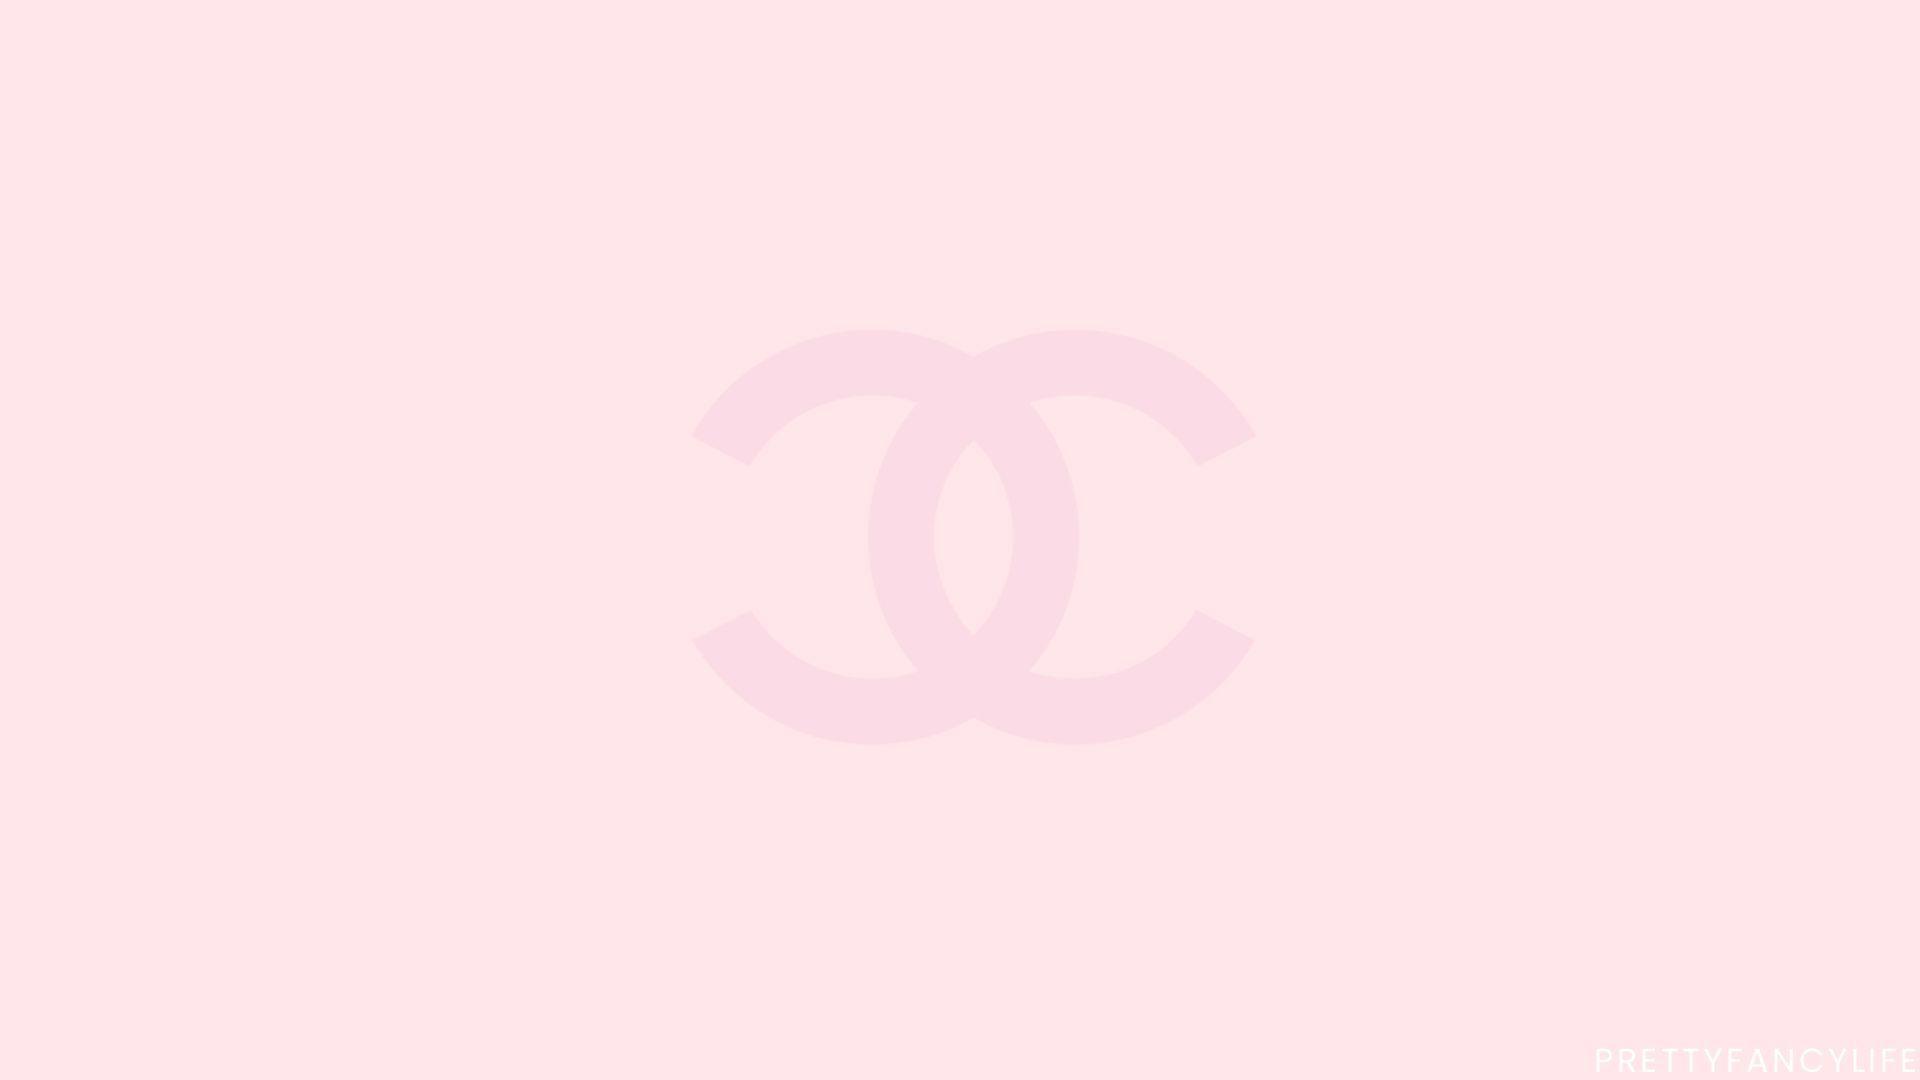 Designer Desktop Wallpaper Pink Wallpaper Backgrounds Free Desktop Wallpaper Free Wallpaper Backgrounds